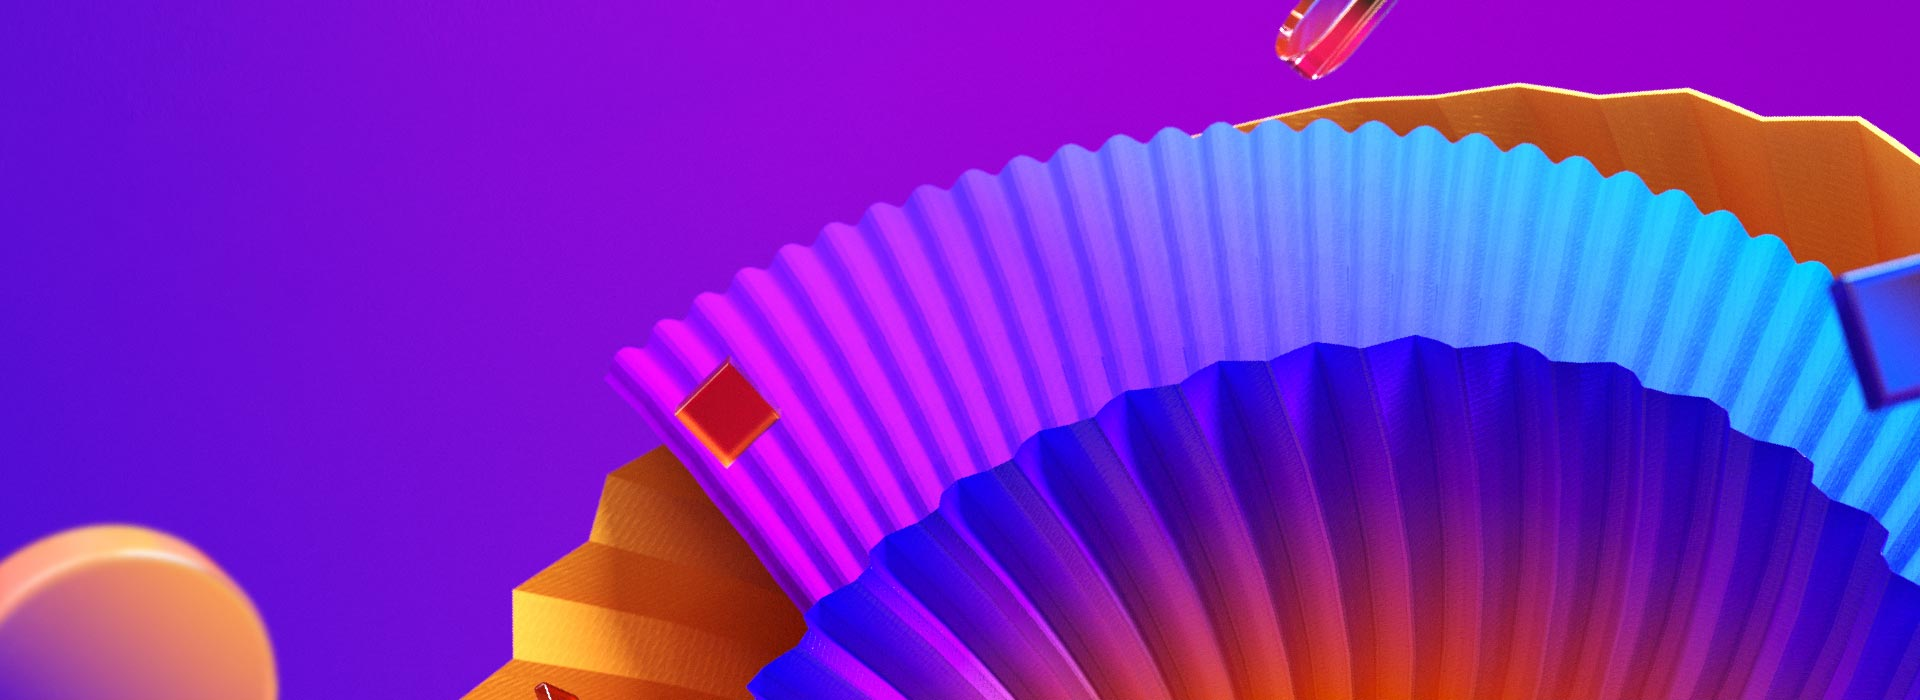 Phoenix is the United Kingdom 2021 Microsoft Partner of the Year